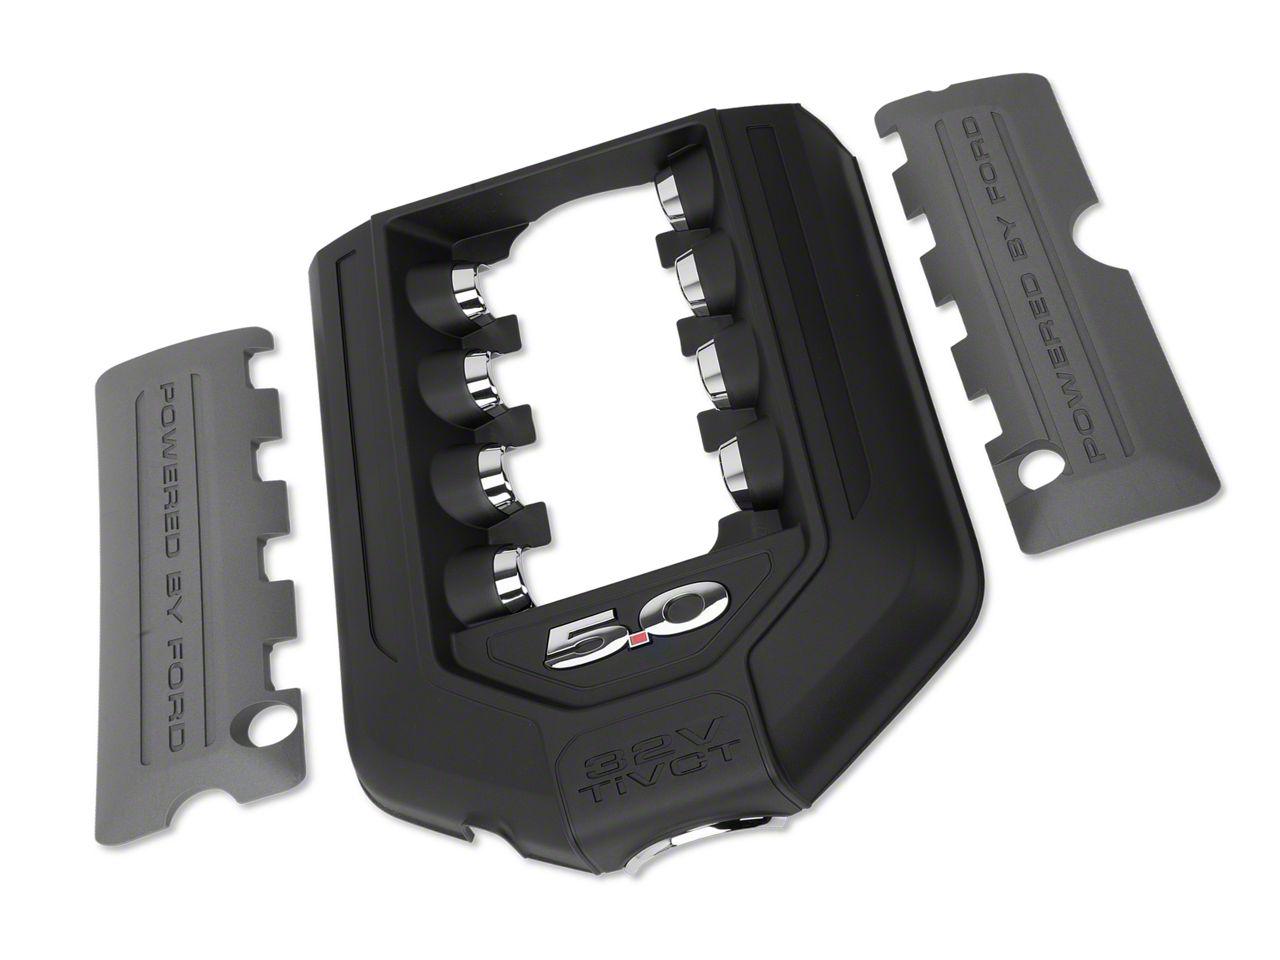 Ford Performance 5.0L Plenum Cover Kit (11-14 GT)